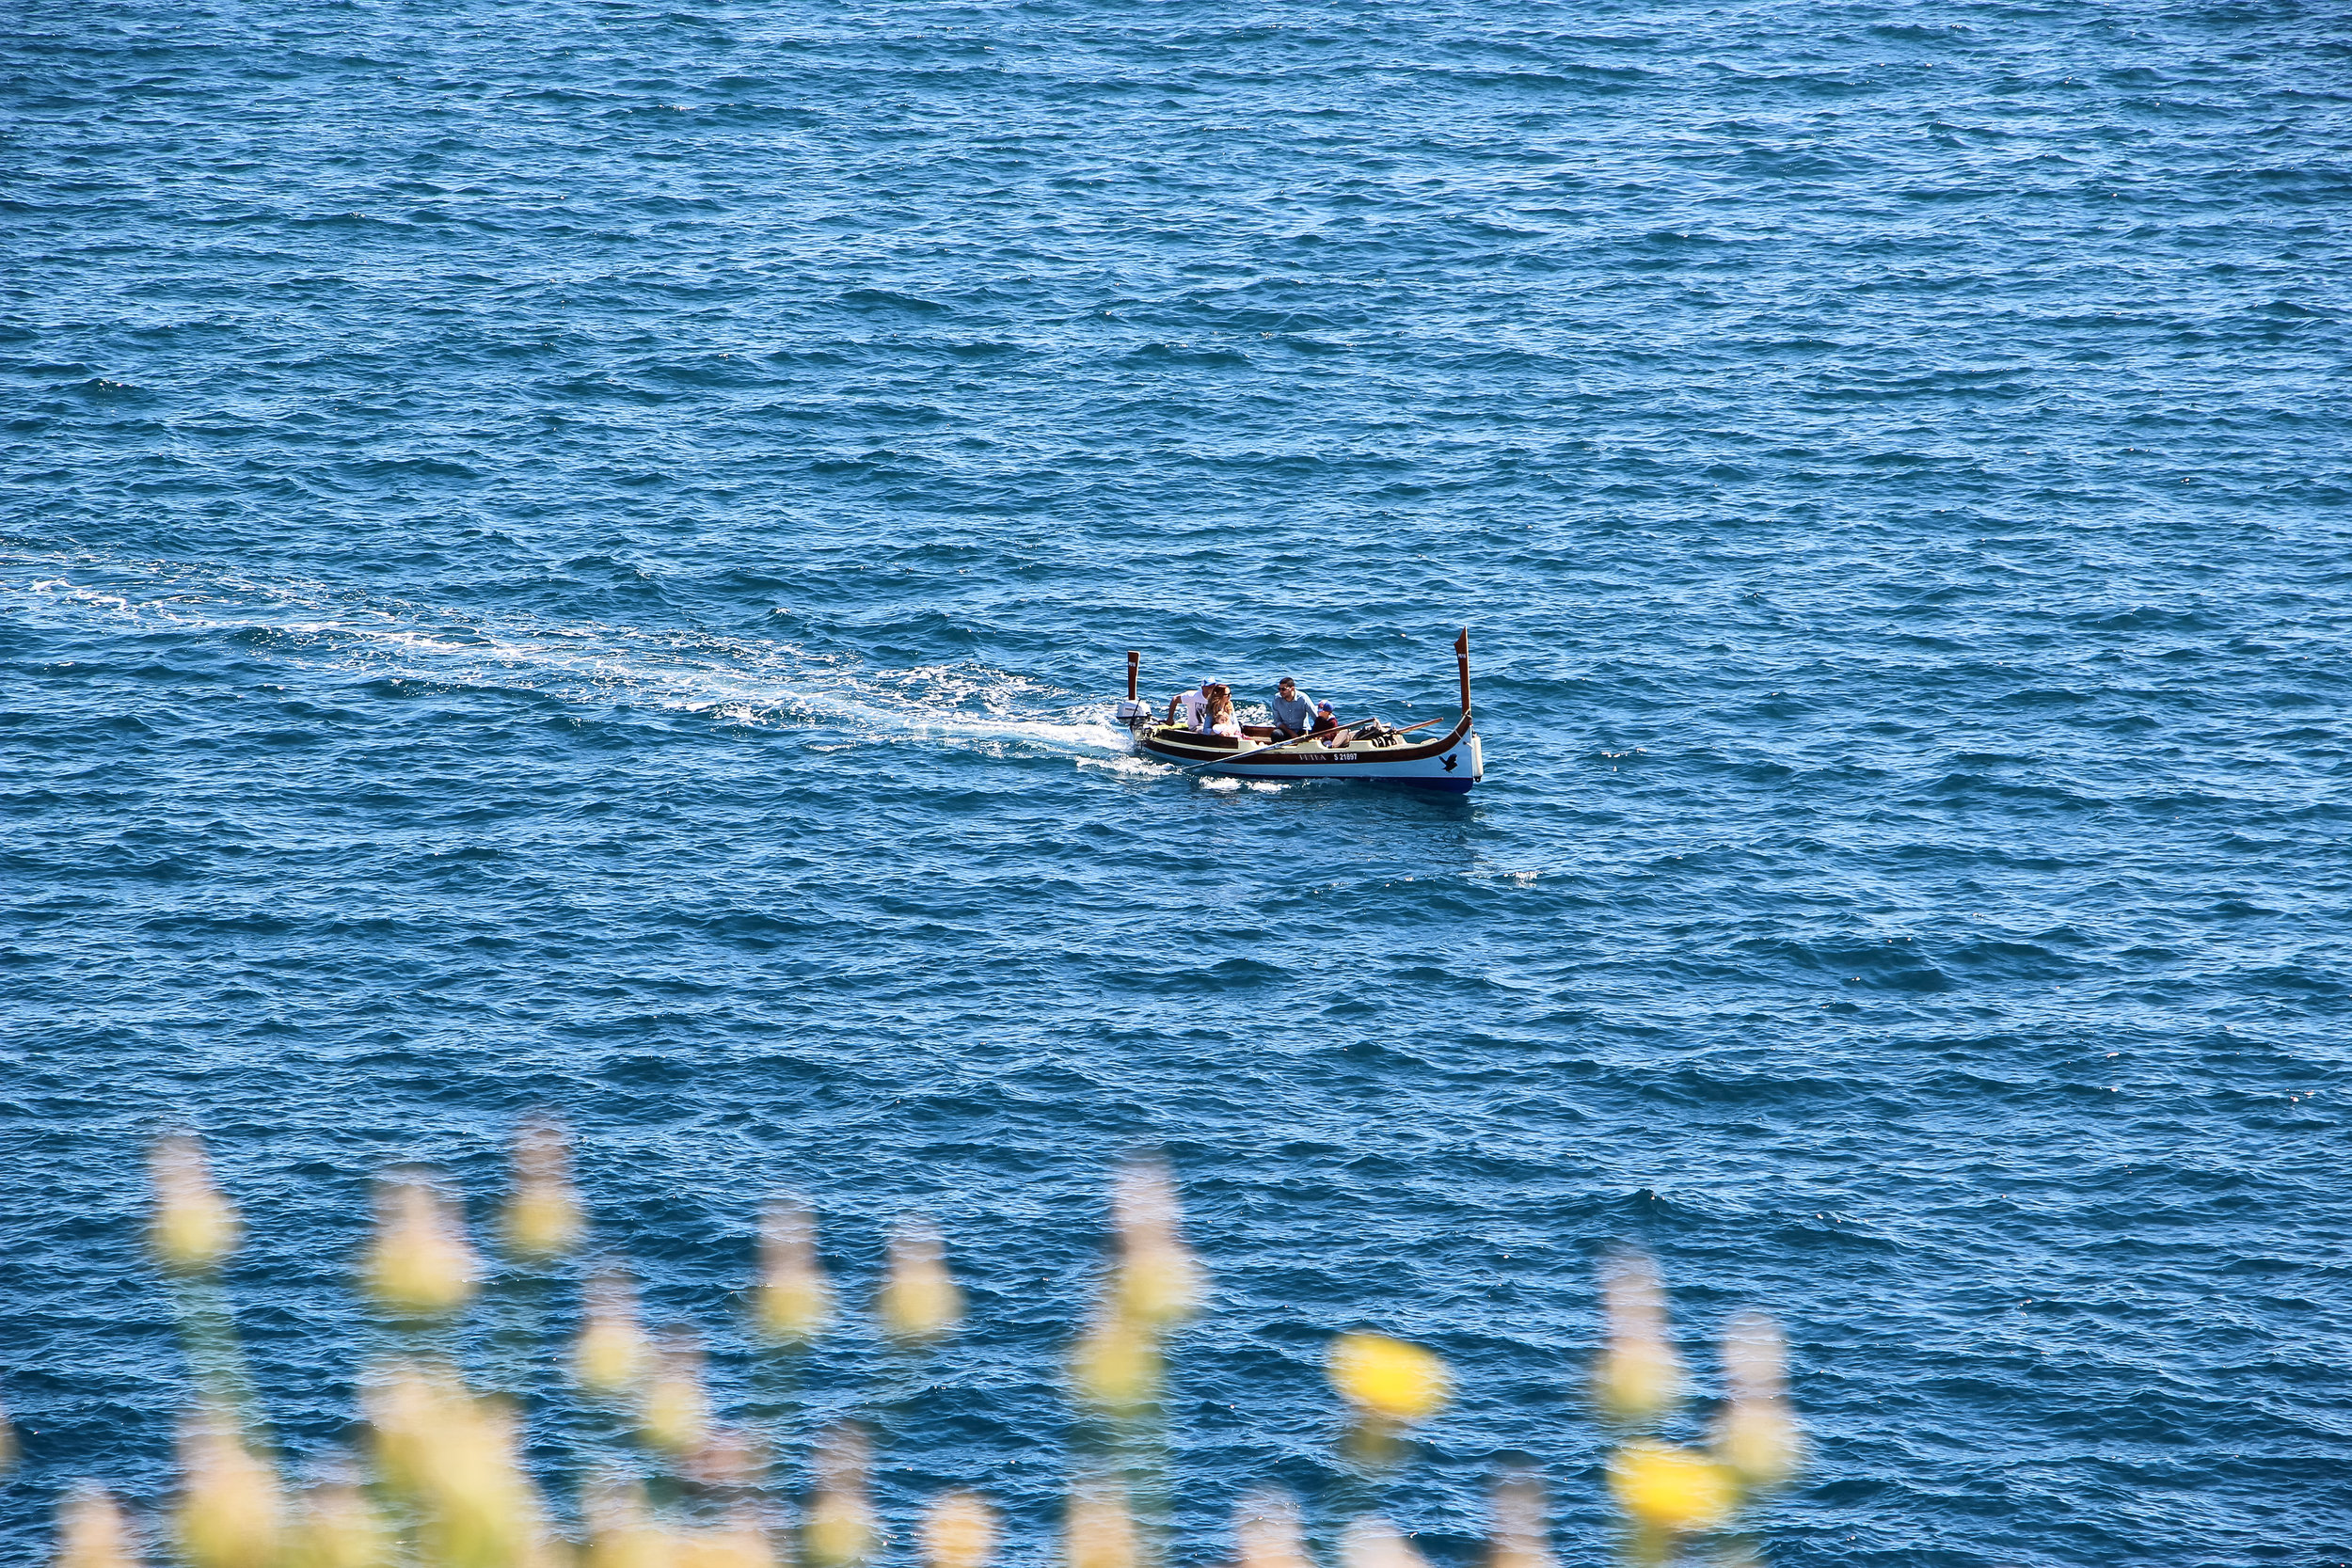 Maltese Boat | the Mediterranean Sea | Valletta | - Thinking About Appreciation For Quality In Malta | Malta, Europe | DoLessGetMoreDone.com | - Canon Minimal Travel Documentary Photography - search for liveability | Sustainability